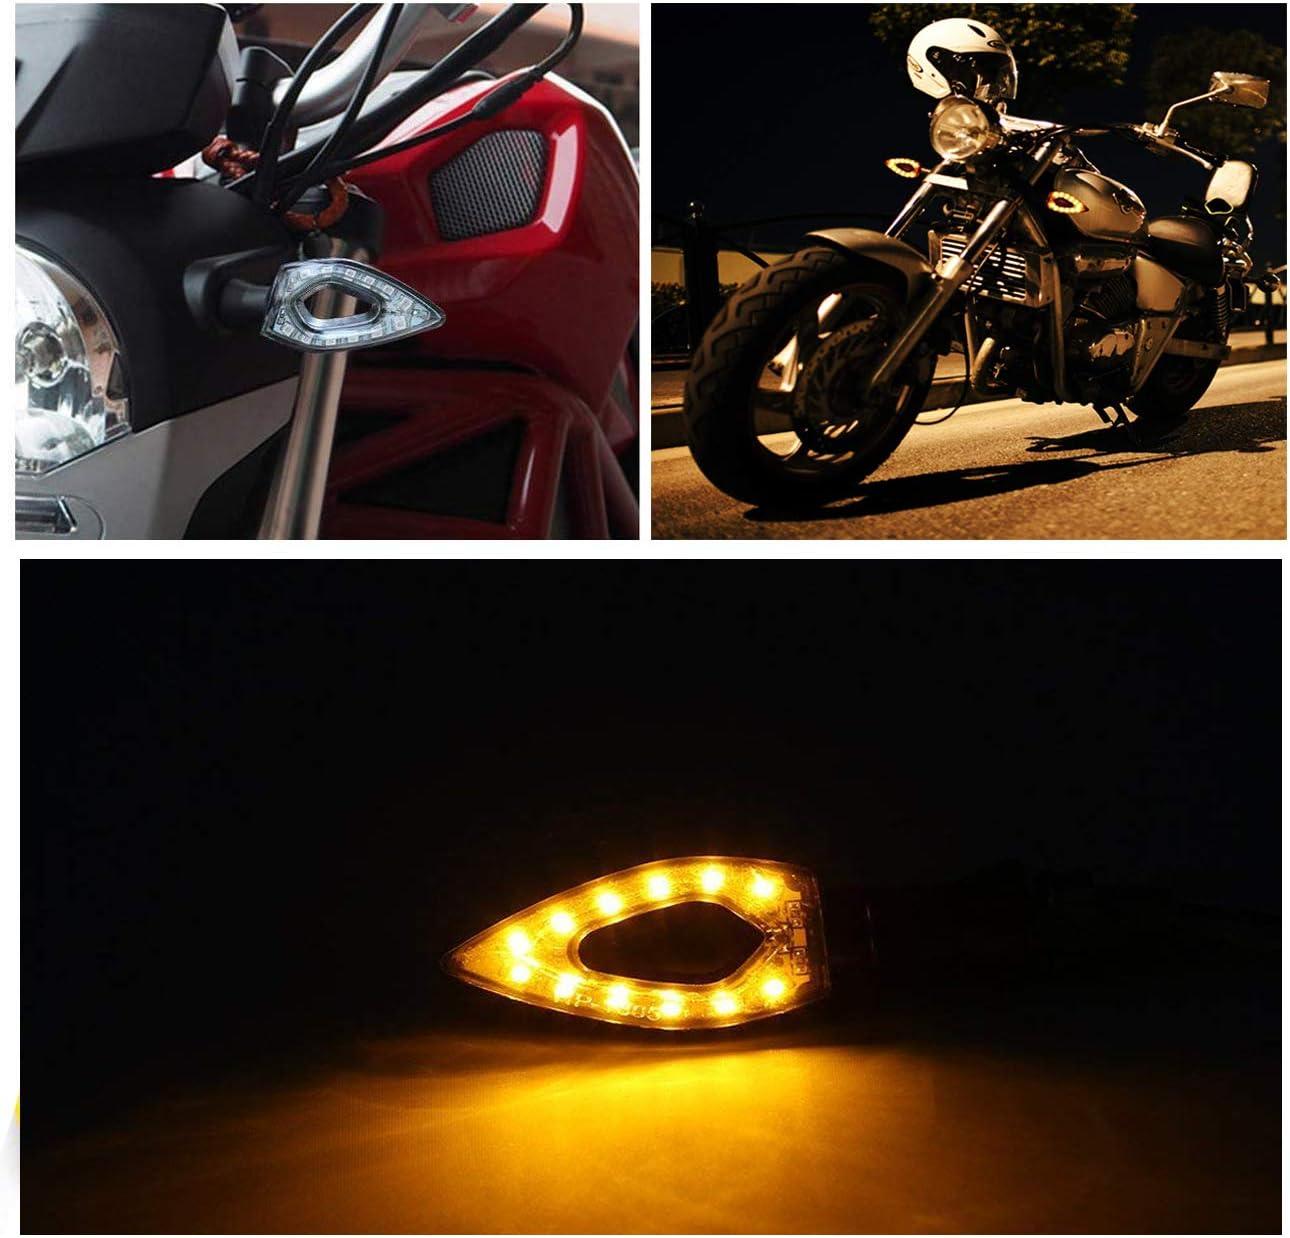 MOTL Motorcycle Turn Signals Lights 12V Universal Motorbike Turn Signal Indicator Blinker Amber Light Lamp for Yamaha Honda Suzuki Kawasaki 2 PCS